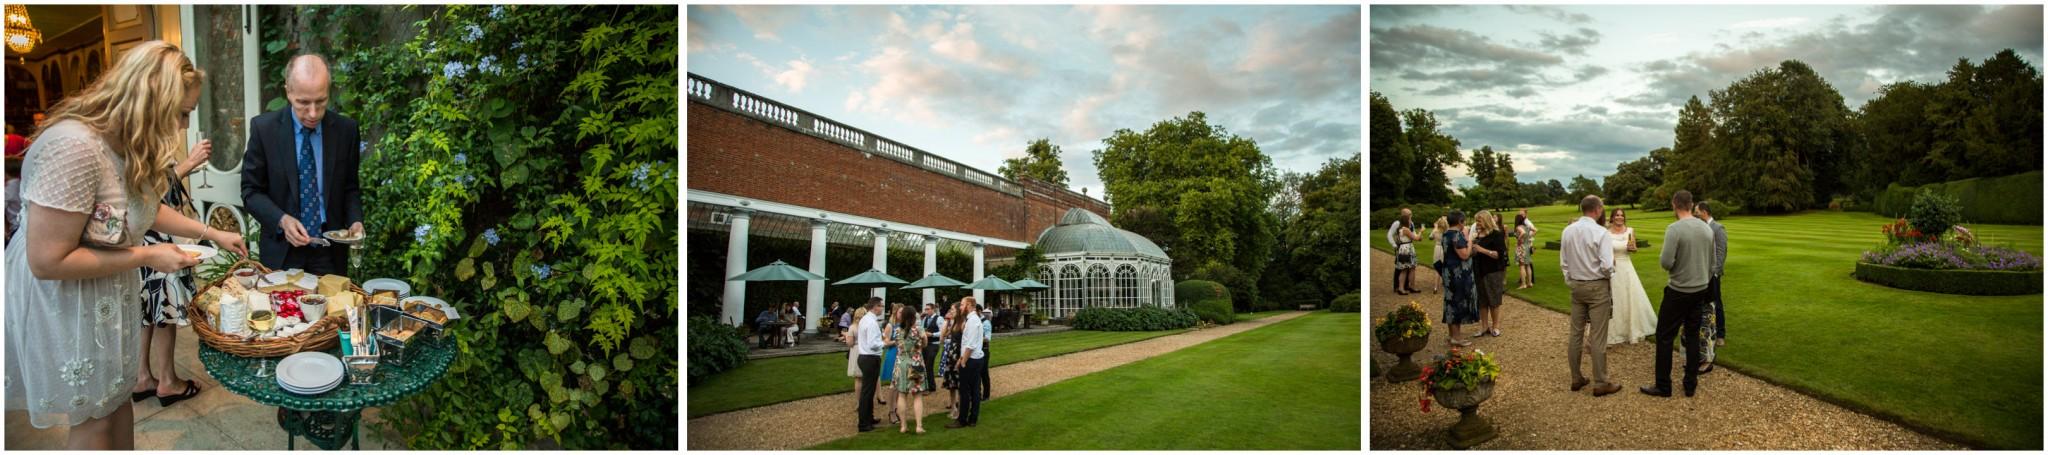 Avington Park Wedding Evening Reception Buffet